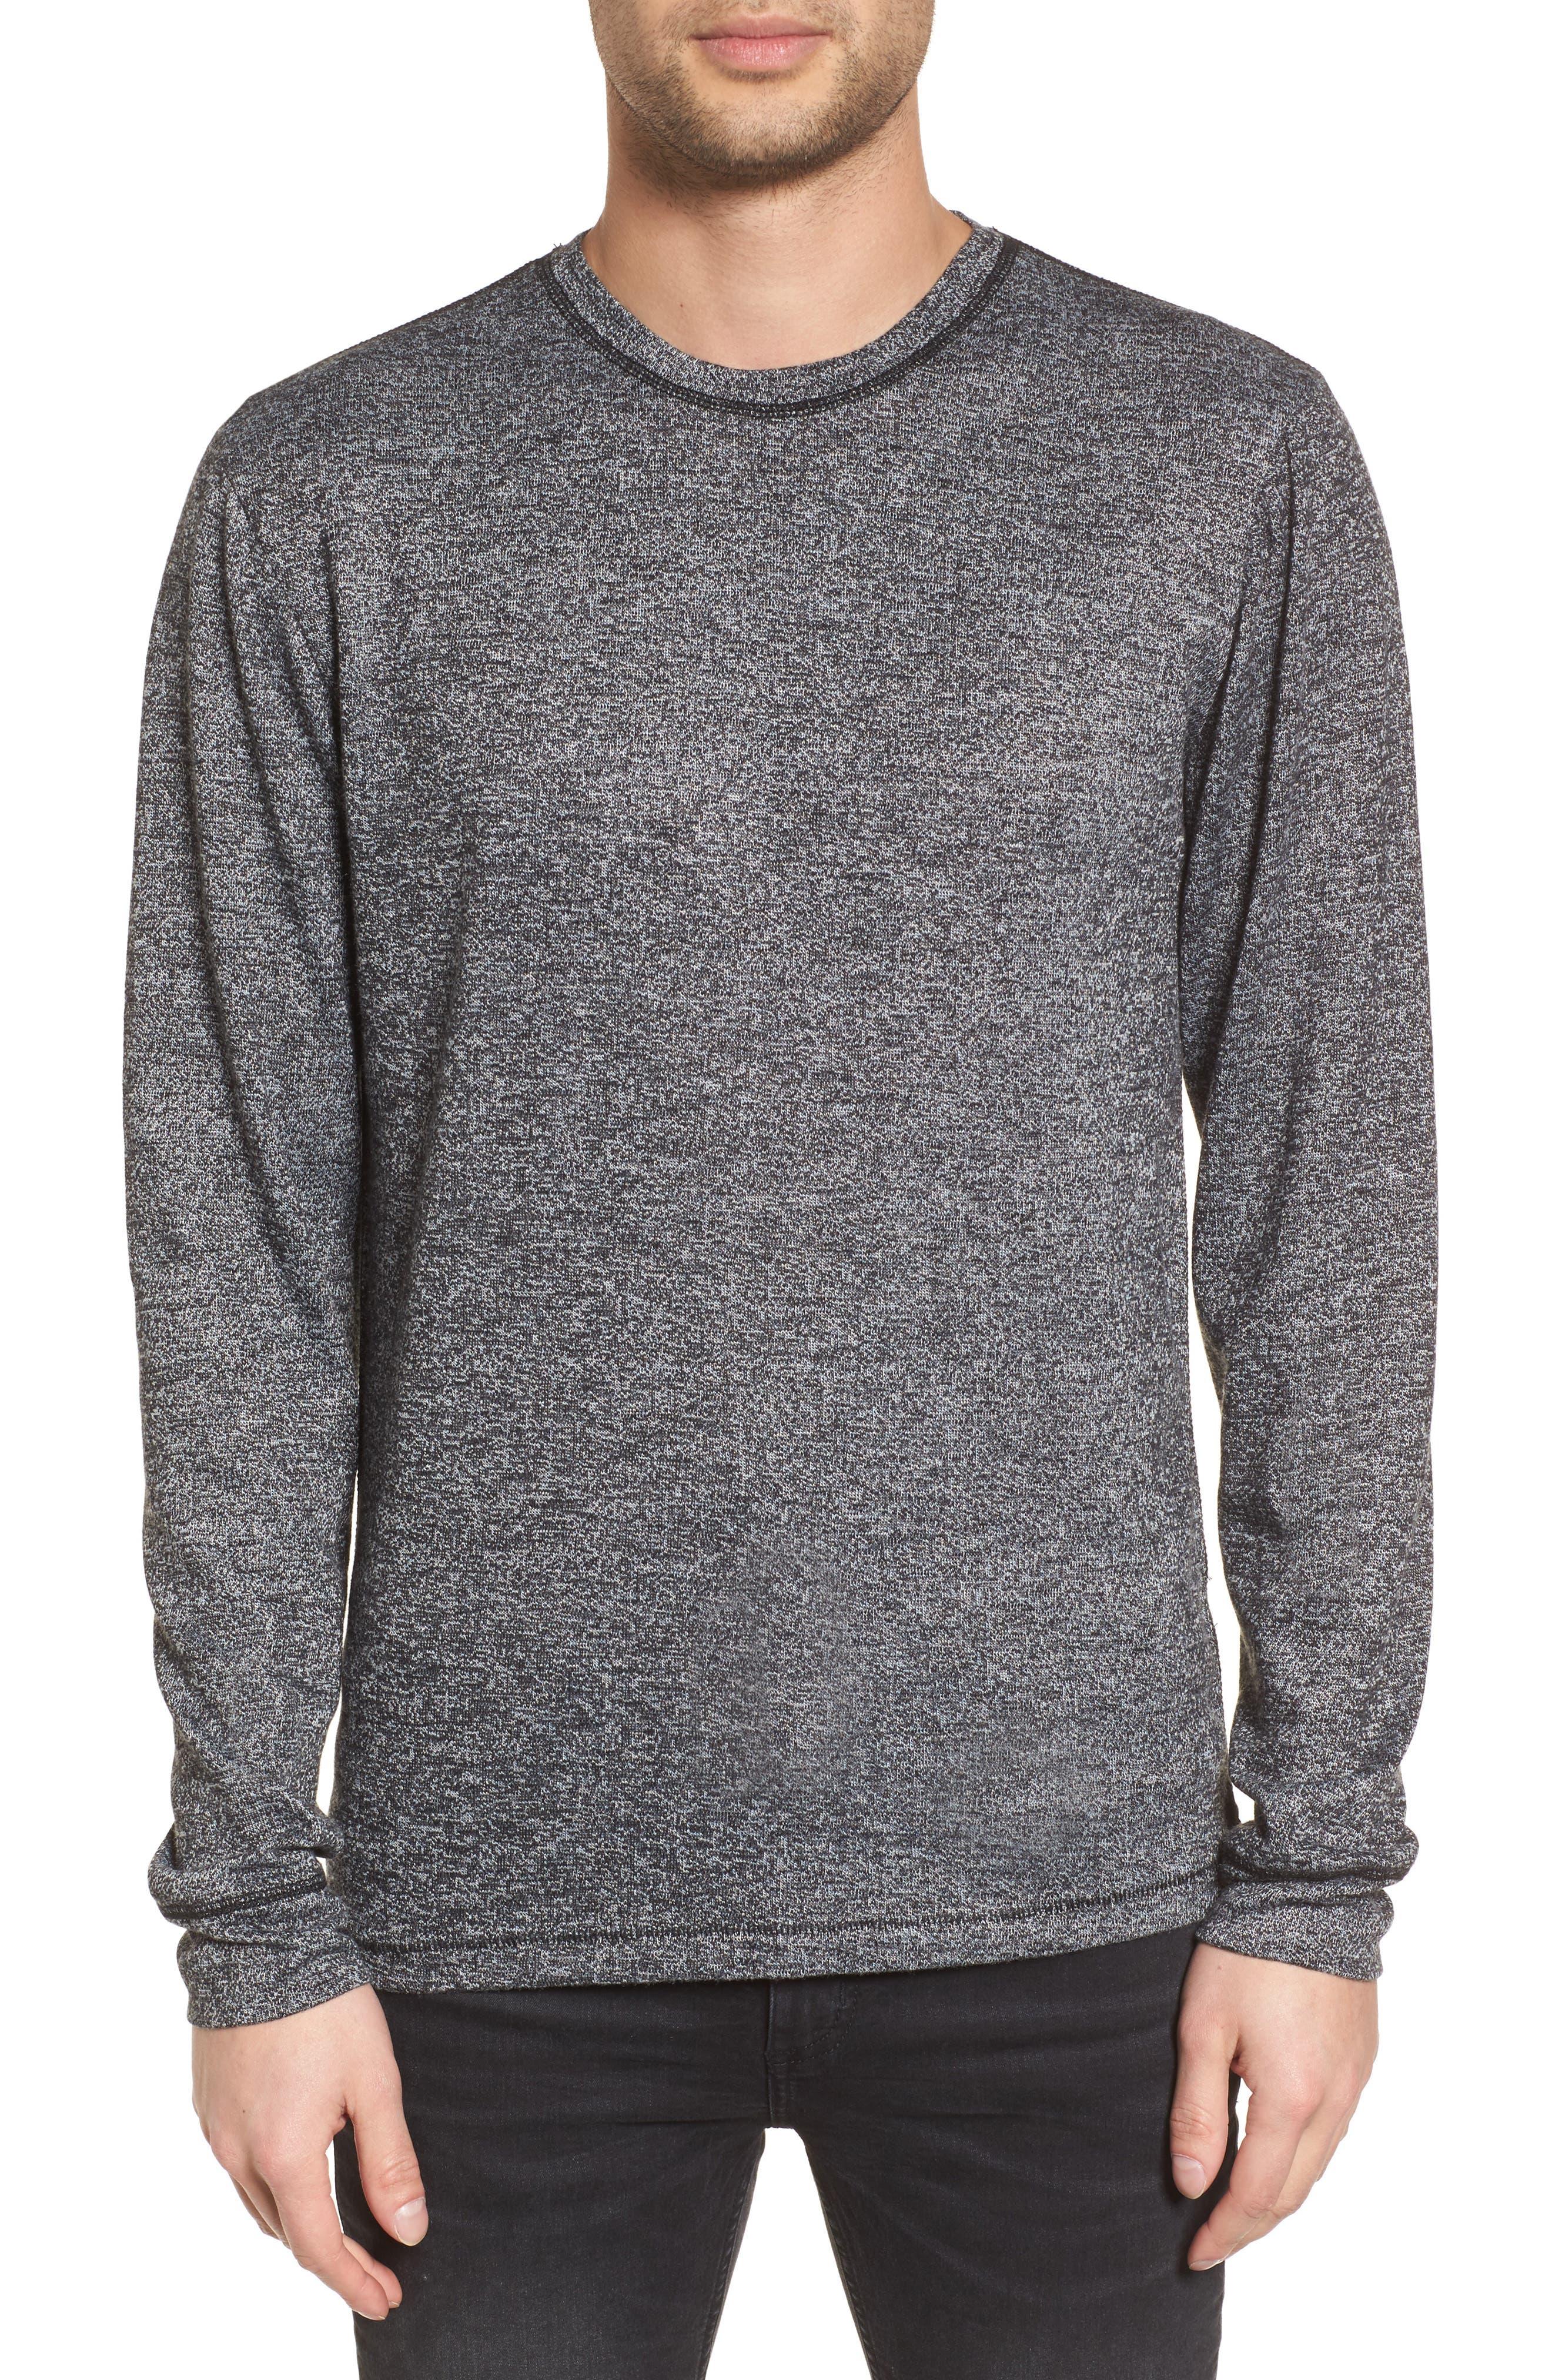 Treasure&Bond Crewneck Sweater,                         Main,                         color, Black Rock